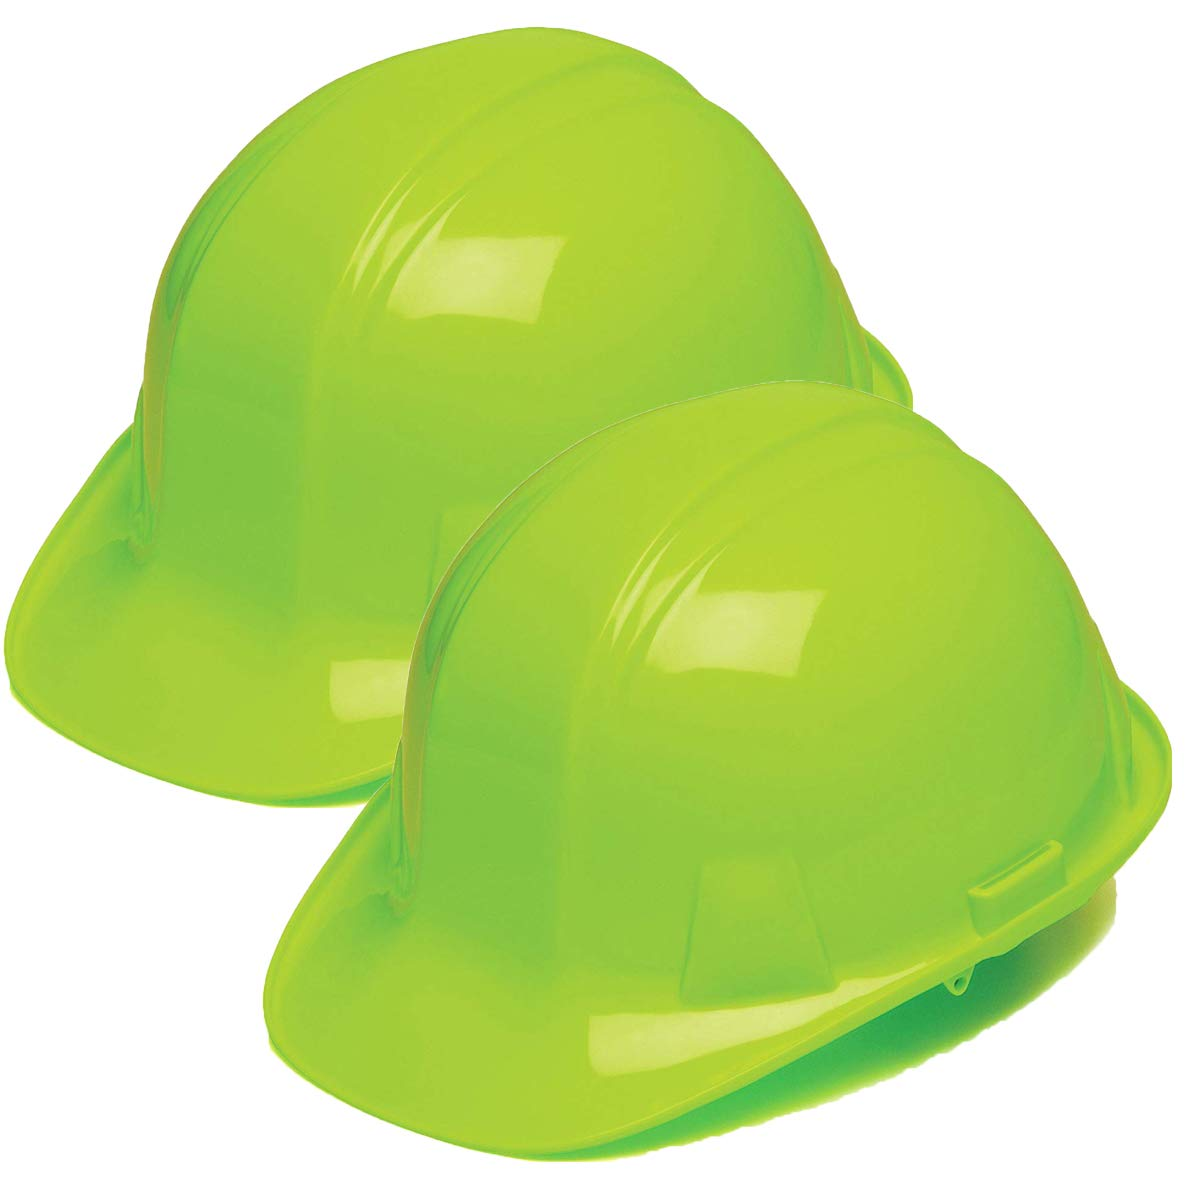 Pyramex Safety Products HP14131 Sl Series 4 Pt. Ratchet Suspension Hard Hat, Hi Vis Lime, (2 Pack)